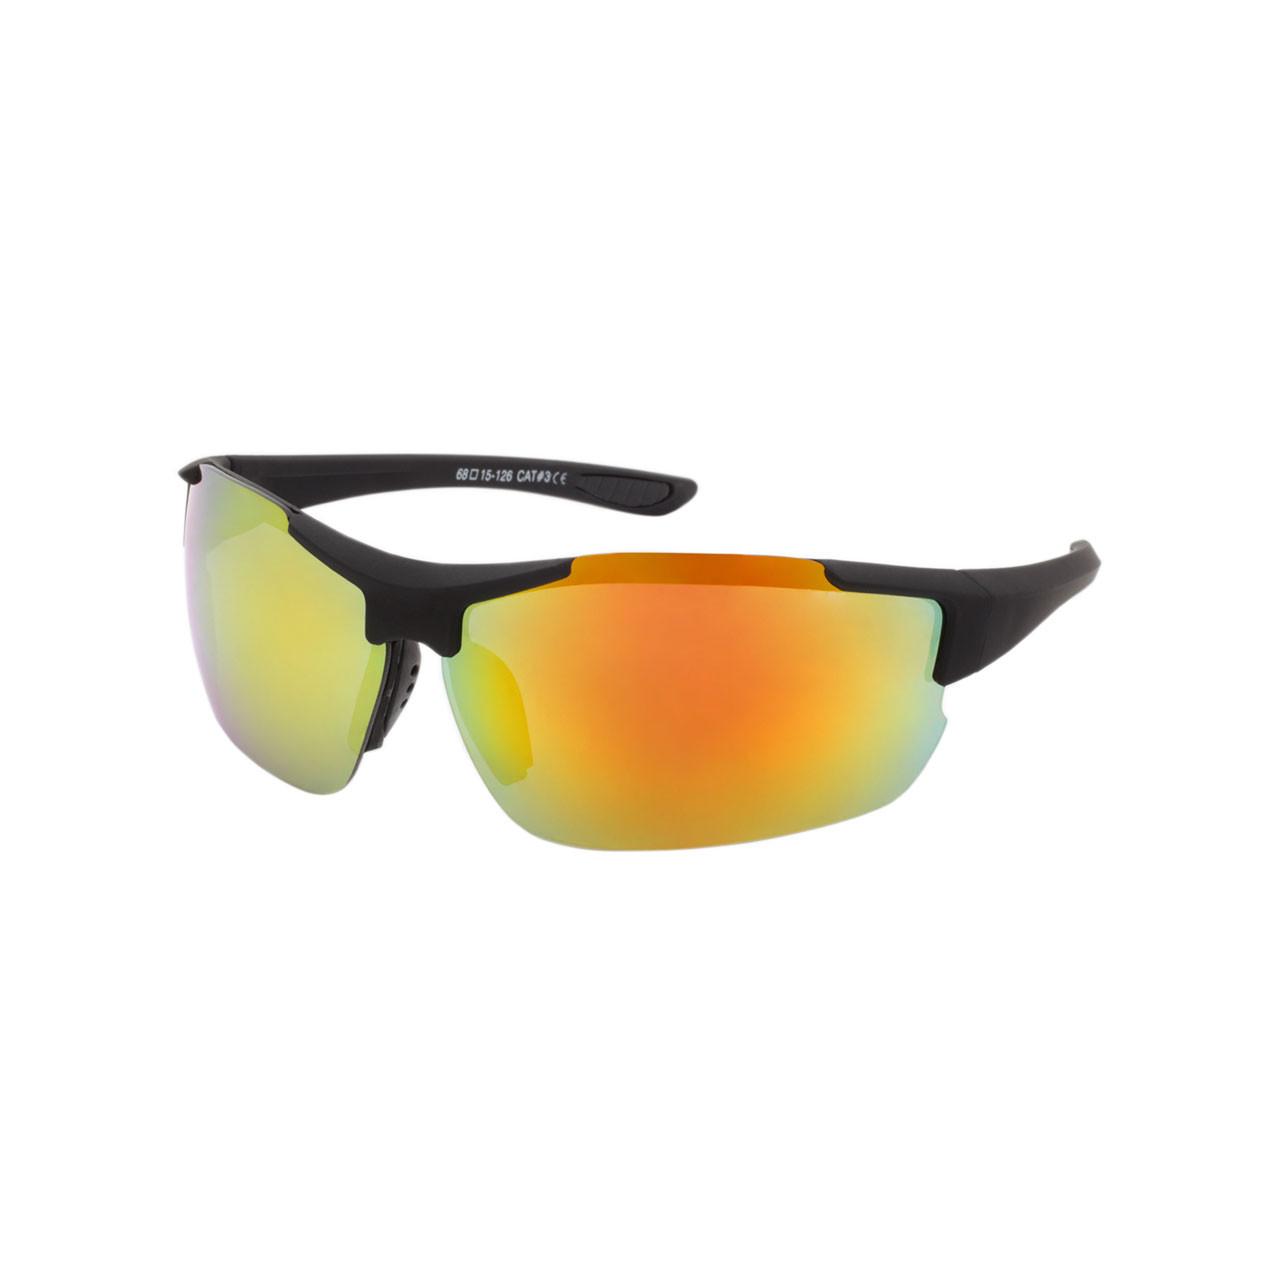 2b76f25eff23 Wholesale Assorted Color Soft Feel UV400 Semi-Rimless Sport ...